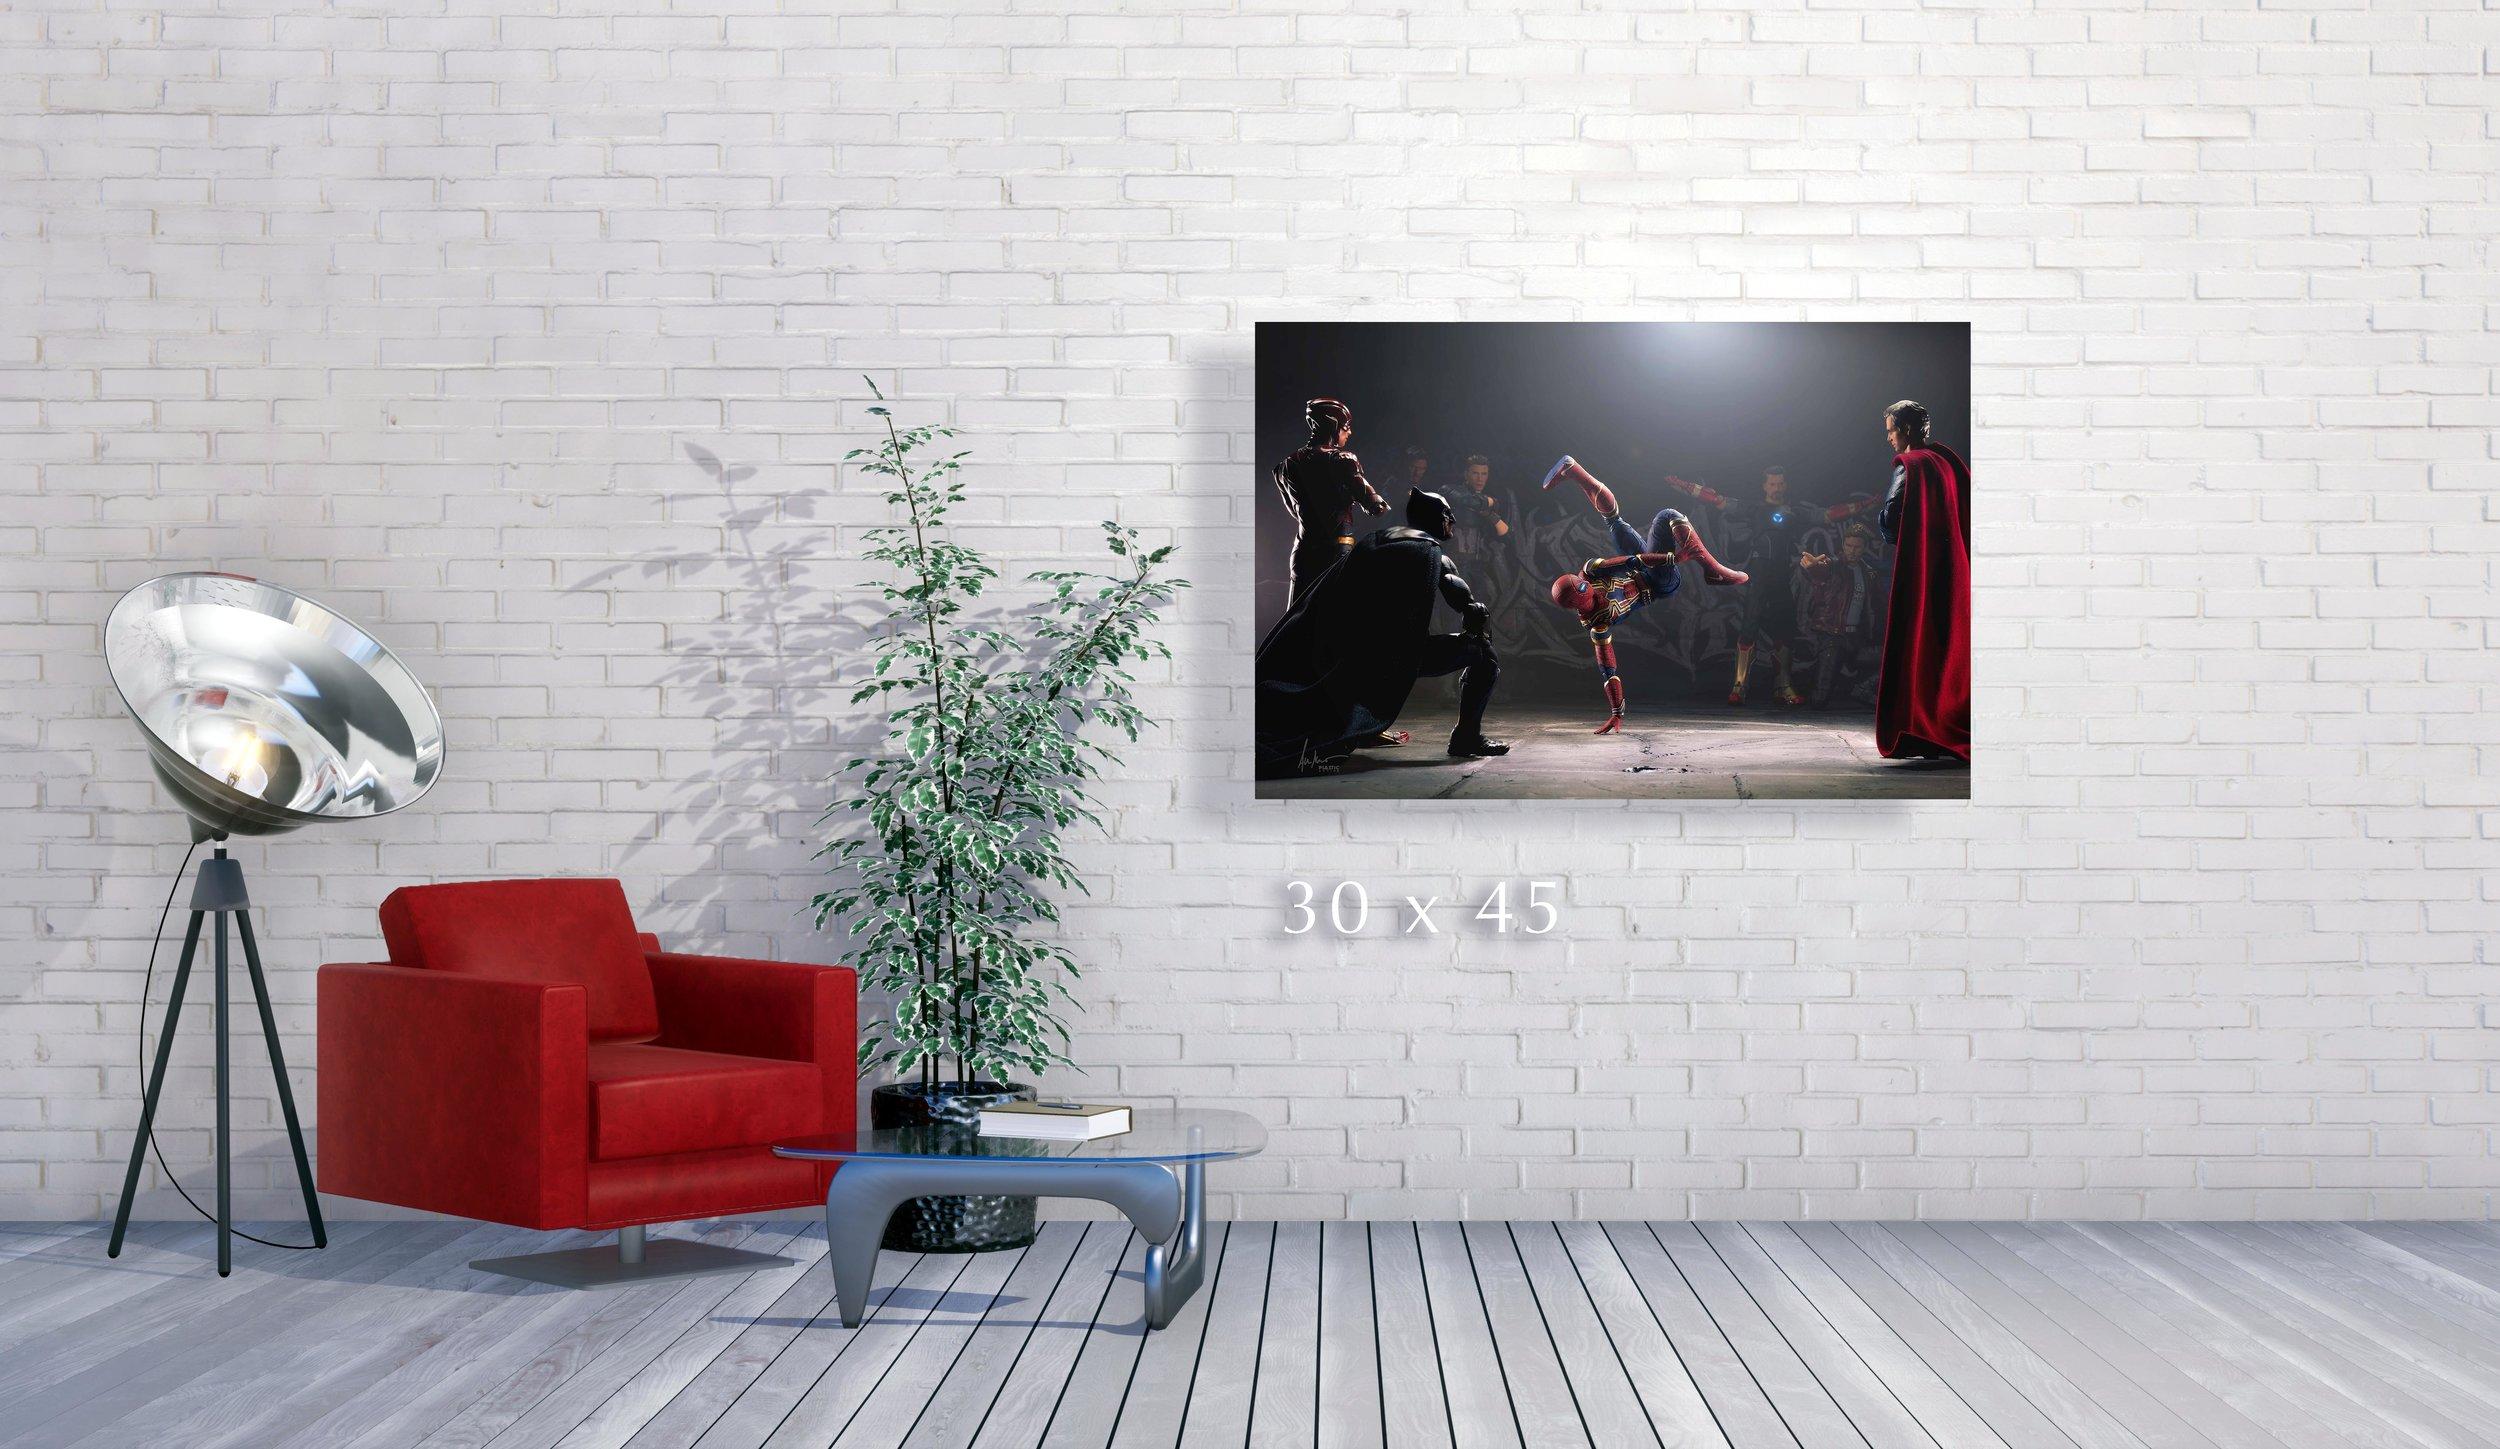 Copy of Minimalist interior with empty white brick wall 3D